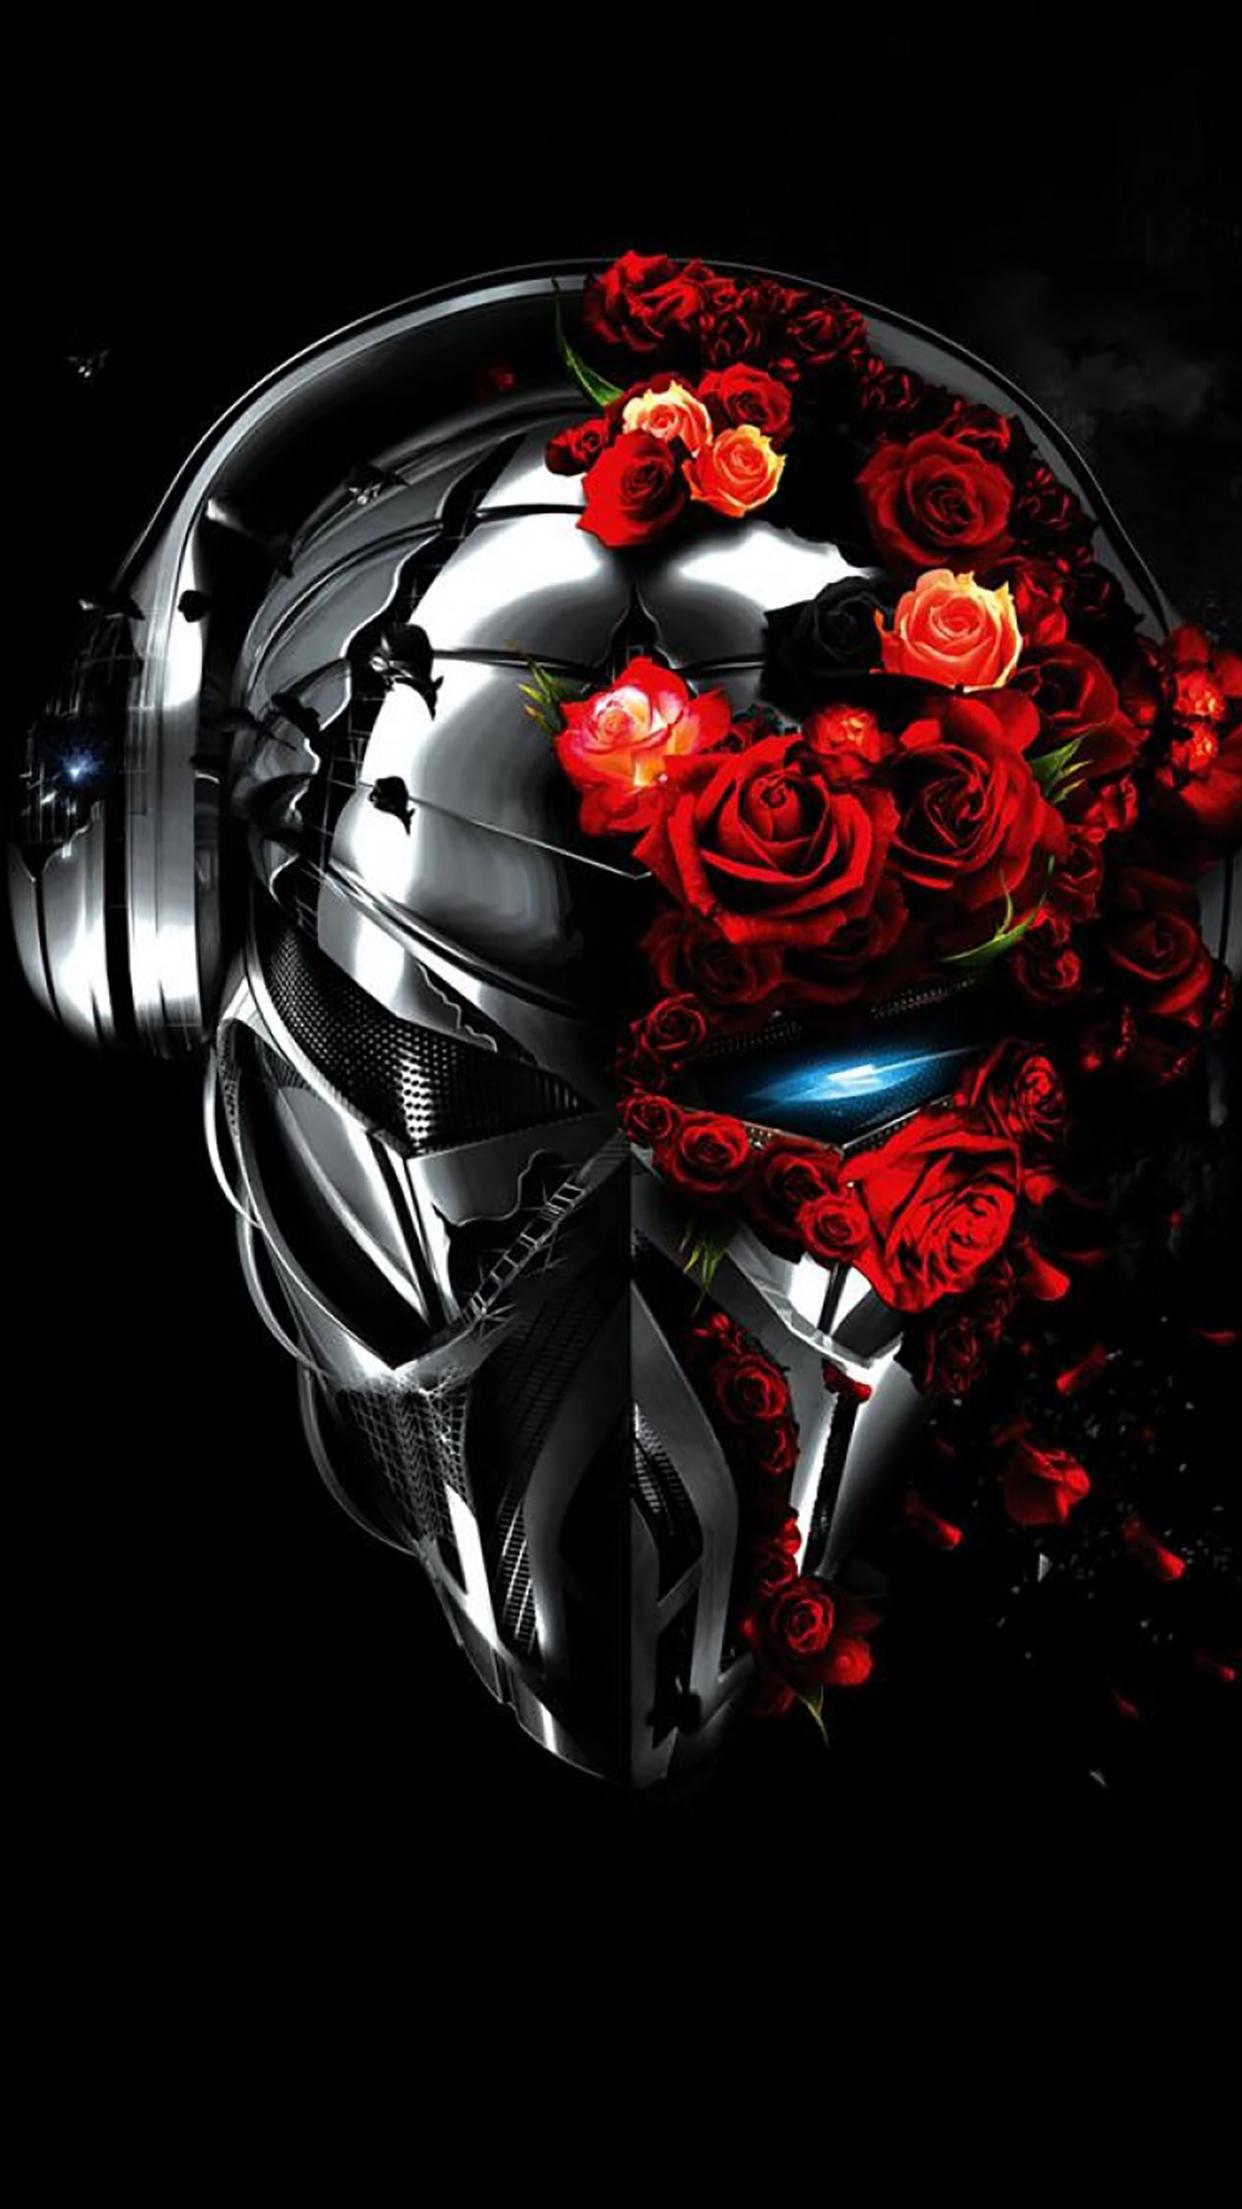 Robot Head 1 3Wallpapers iPhone Parallax Robot : Head 1